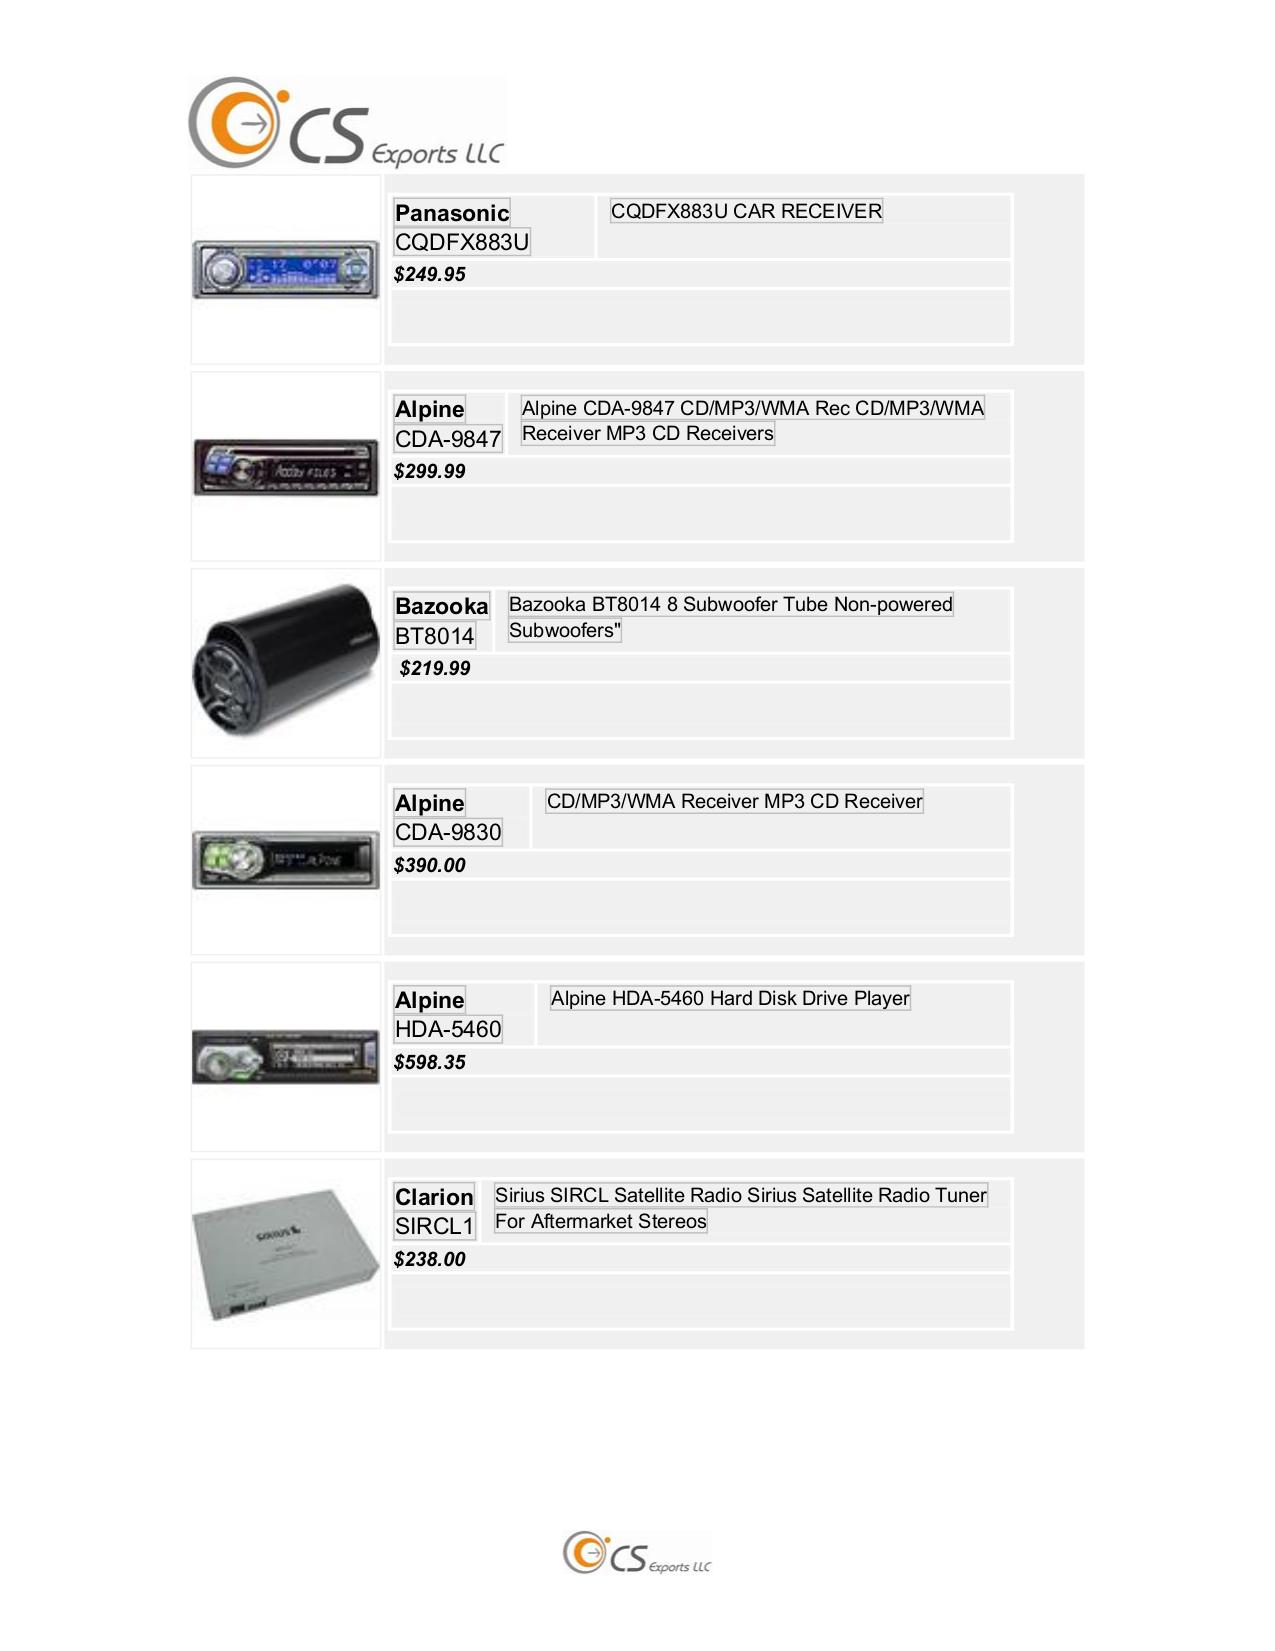 pdf for panasonic car receiver cq-c8100u manual